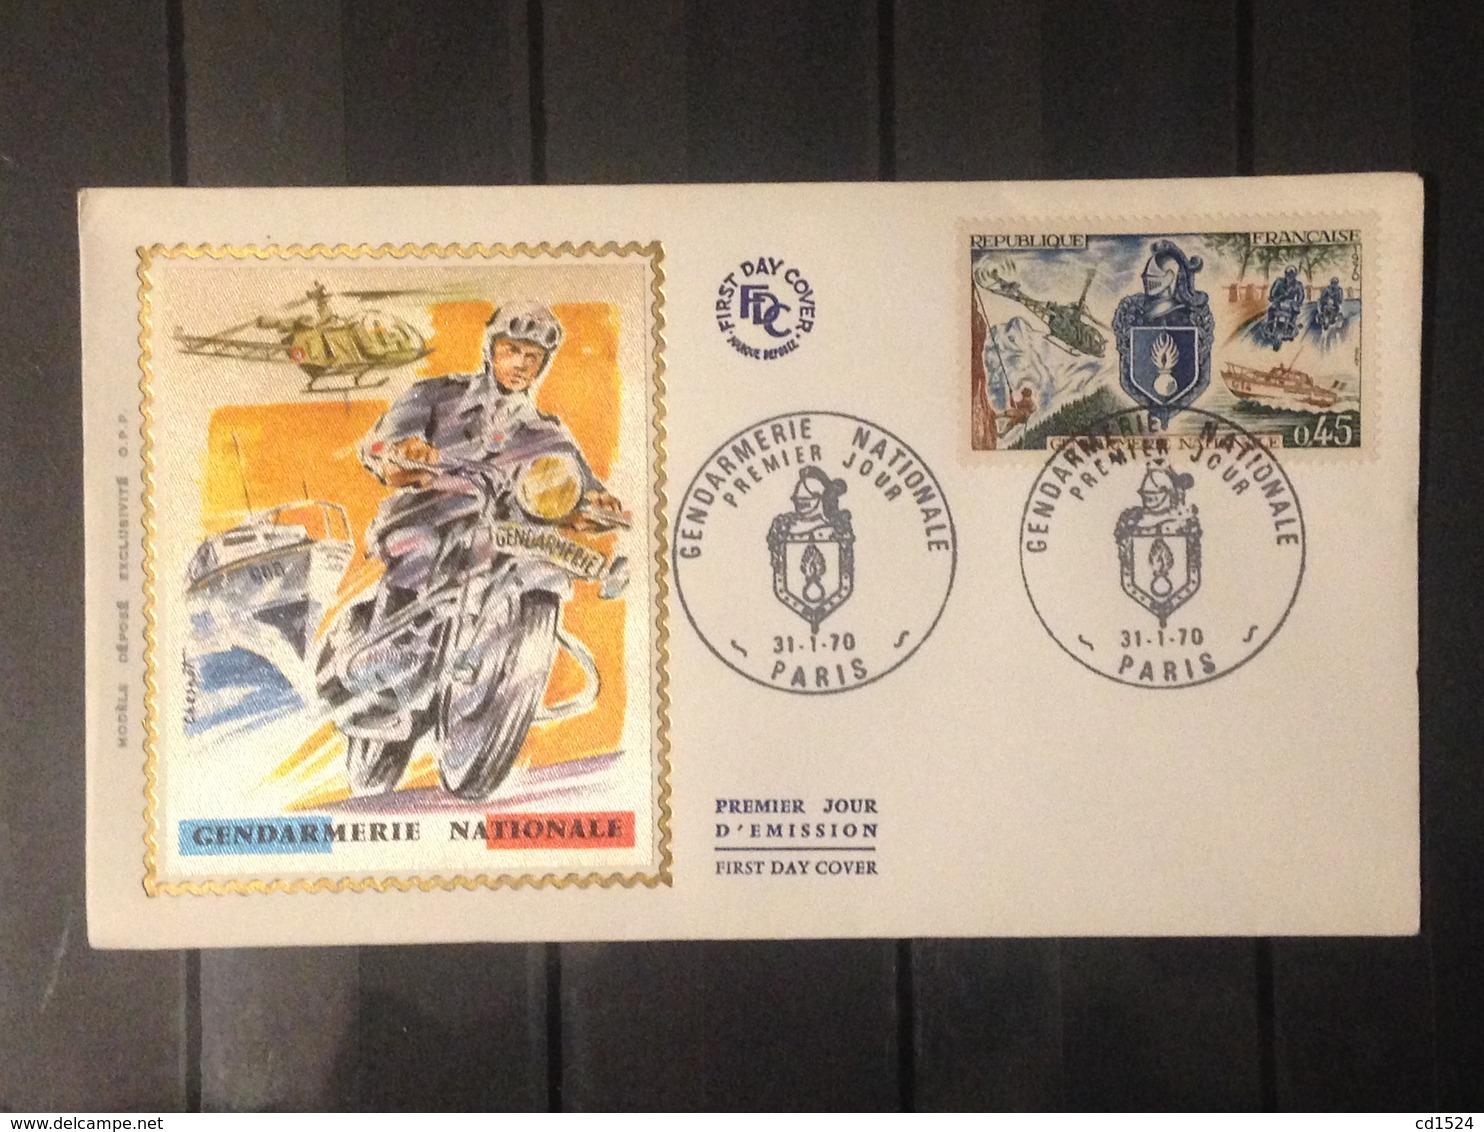 France - 1970 - Enveloppe 1er Jour - Gendarmerie Nationale - Oblitérés